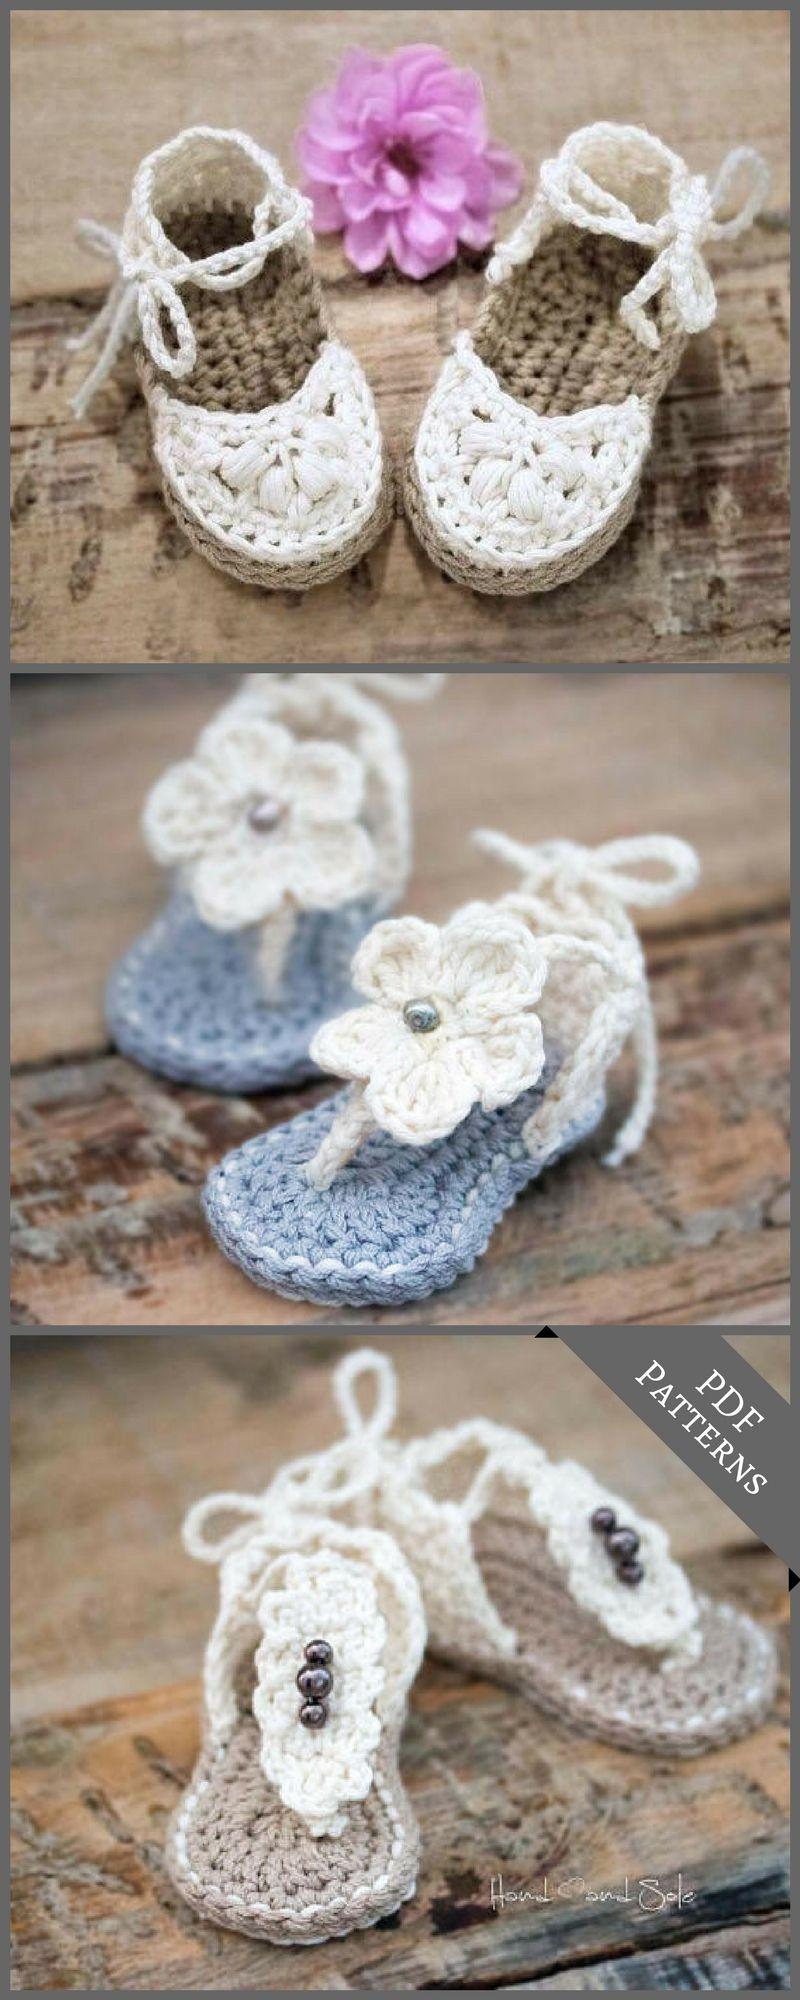 Cute crochet pattern for sandals for little feet. #Etsy #TLad